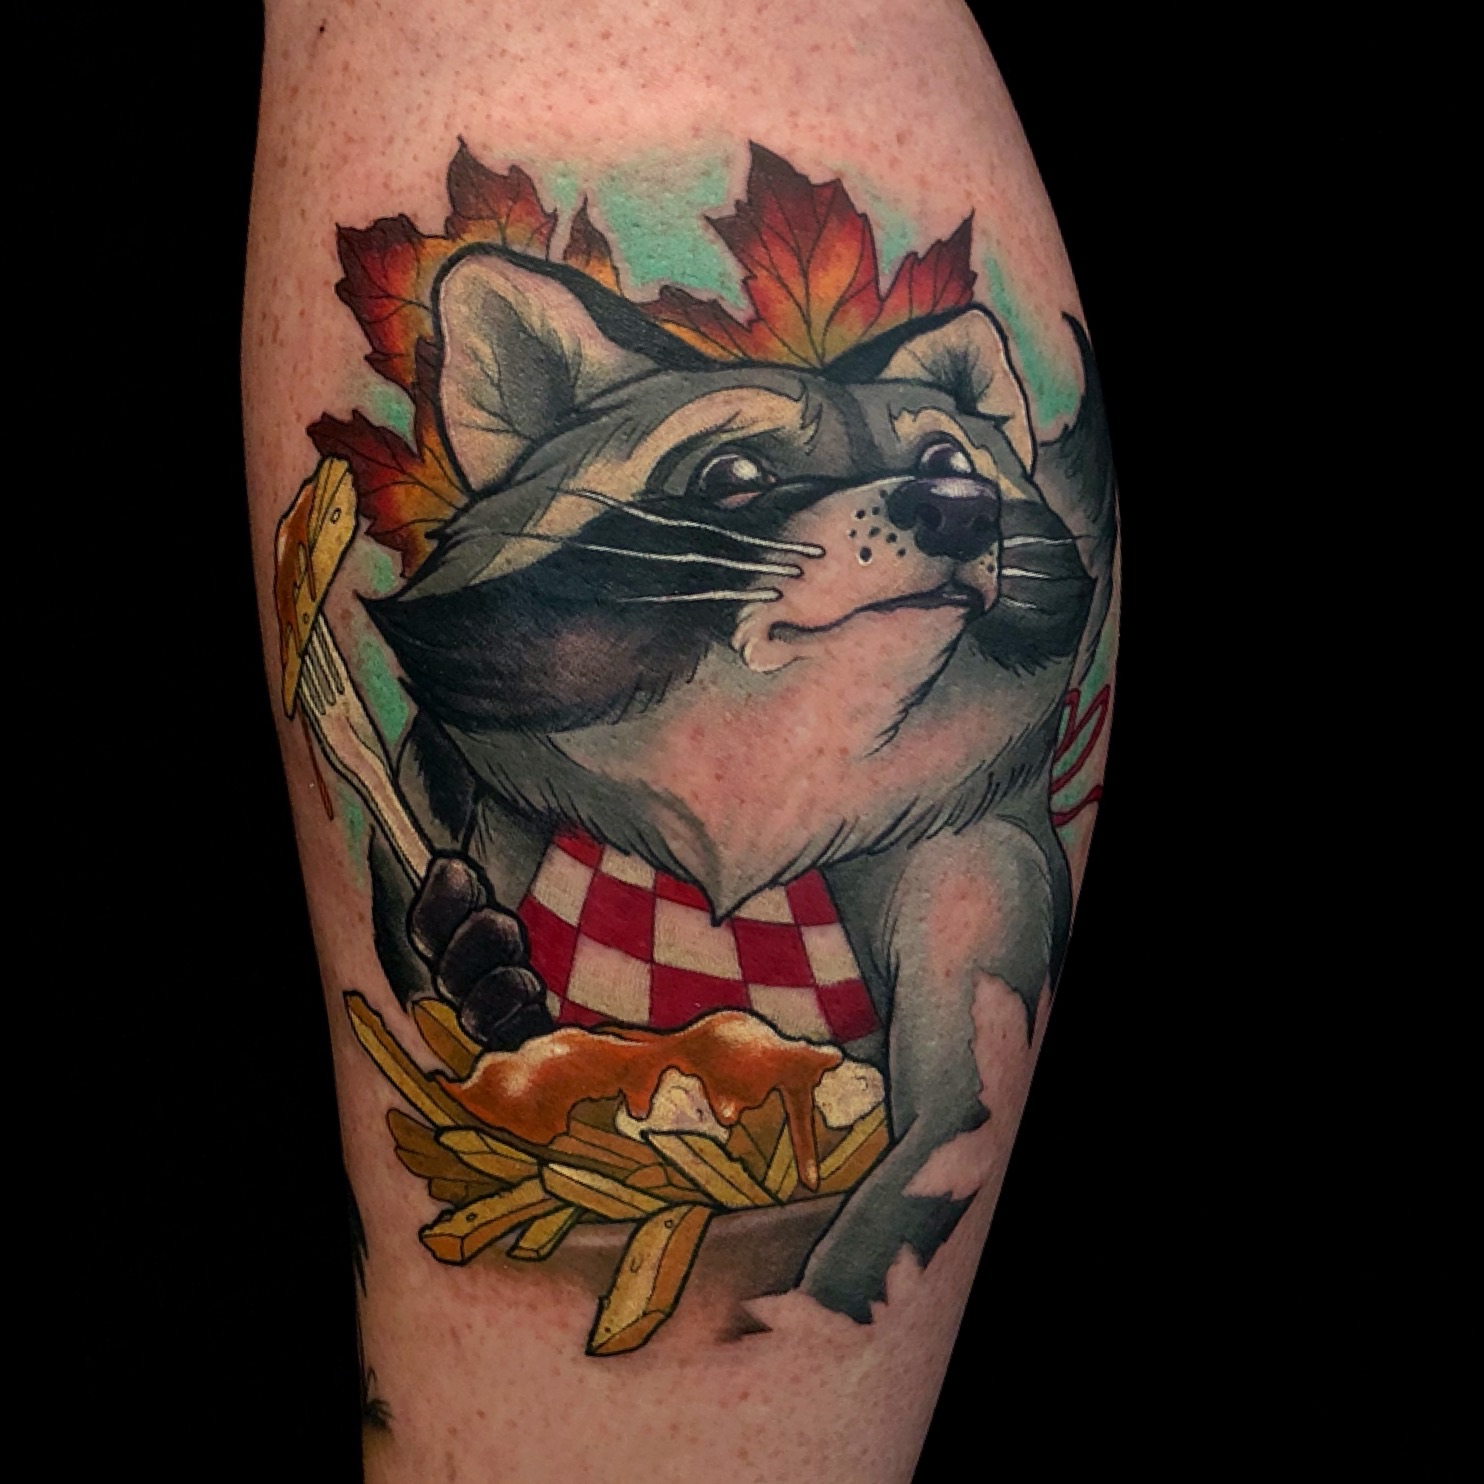 Anne-Marie Dupuis Tattoo 2019 Okanagan Tattoo Show & Brewfest Artist